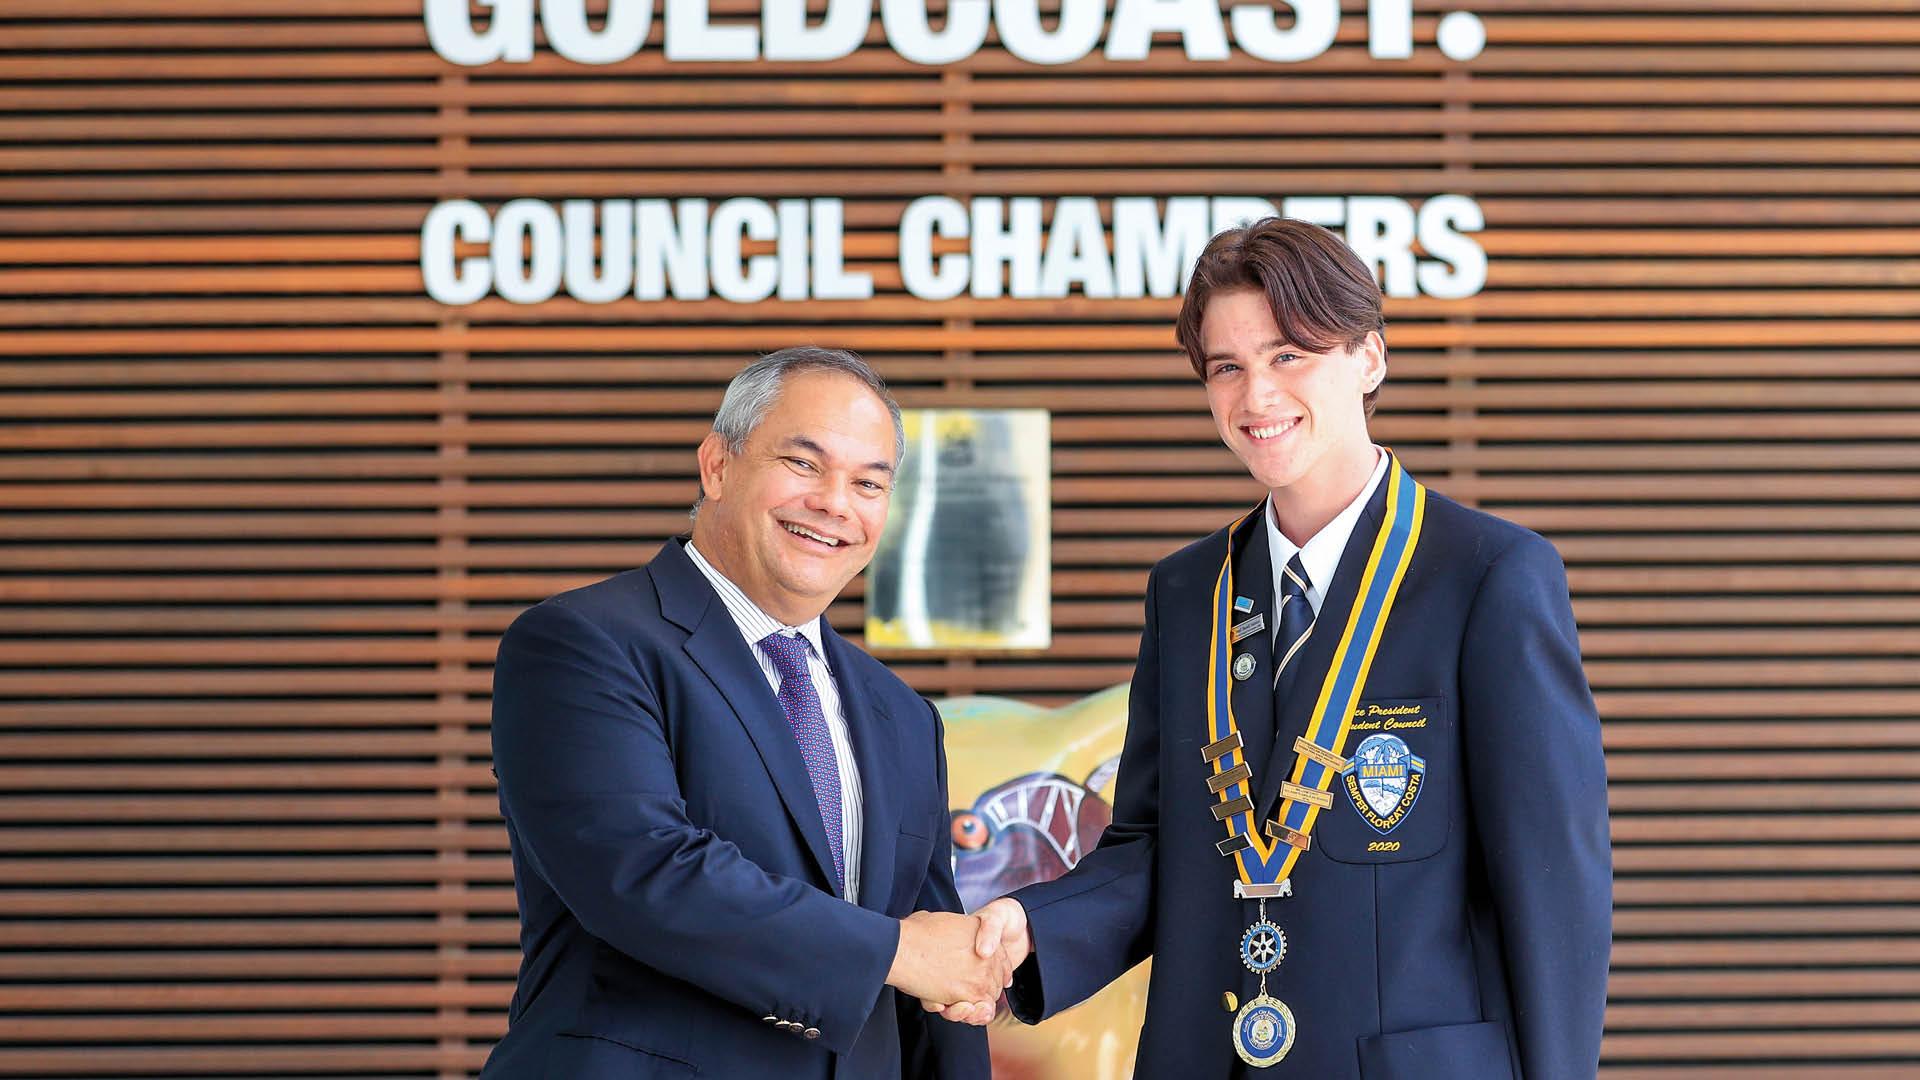 Gold Coast Interactor heads up Junior Council